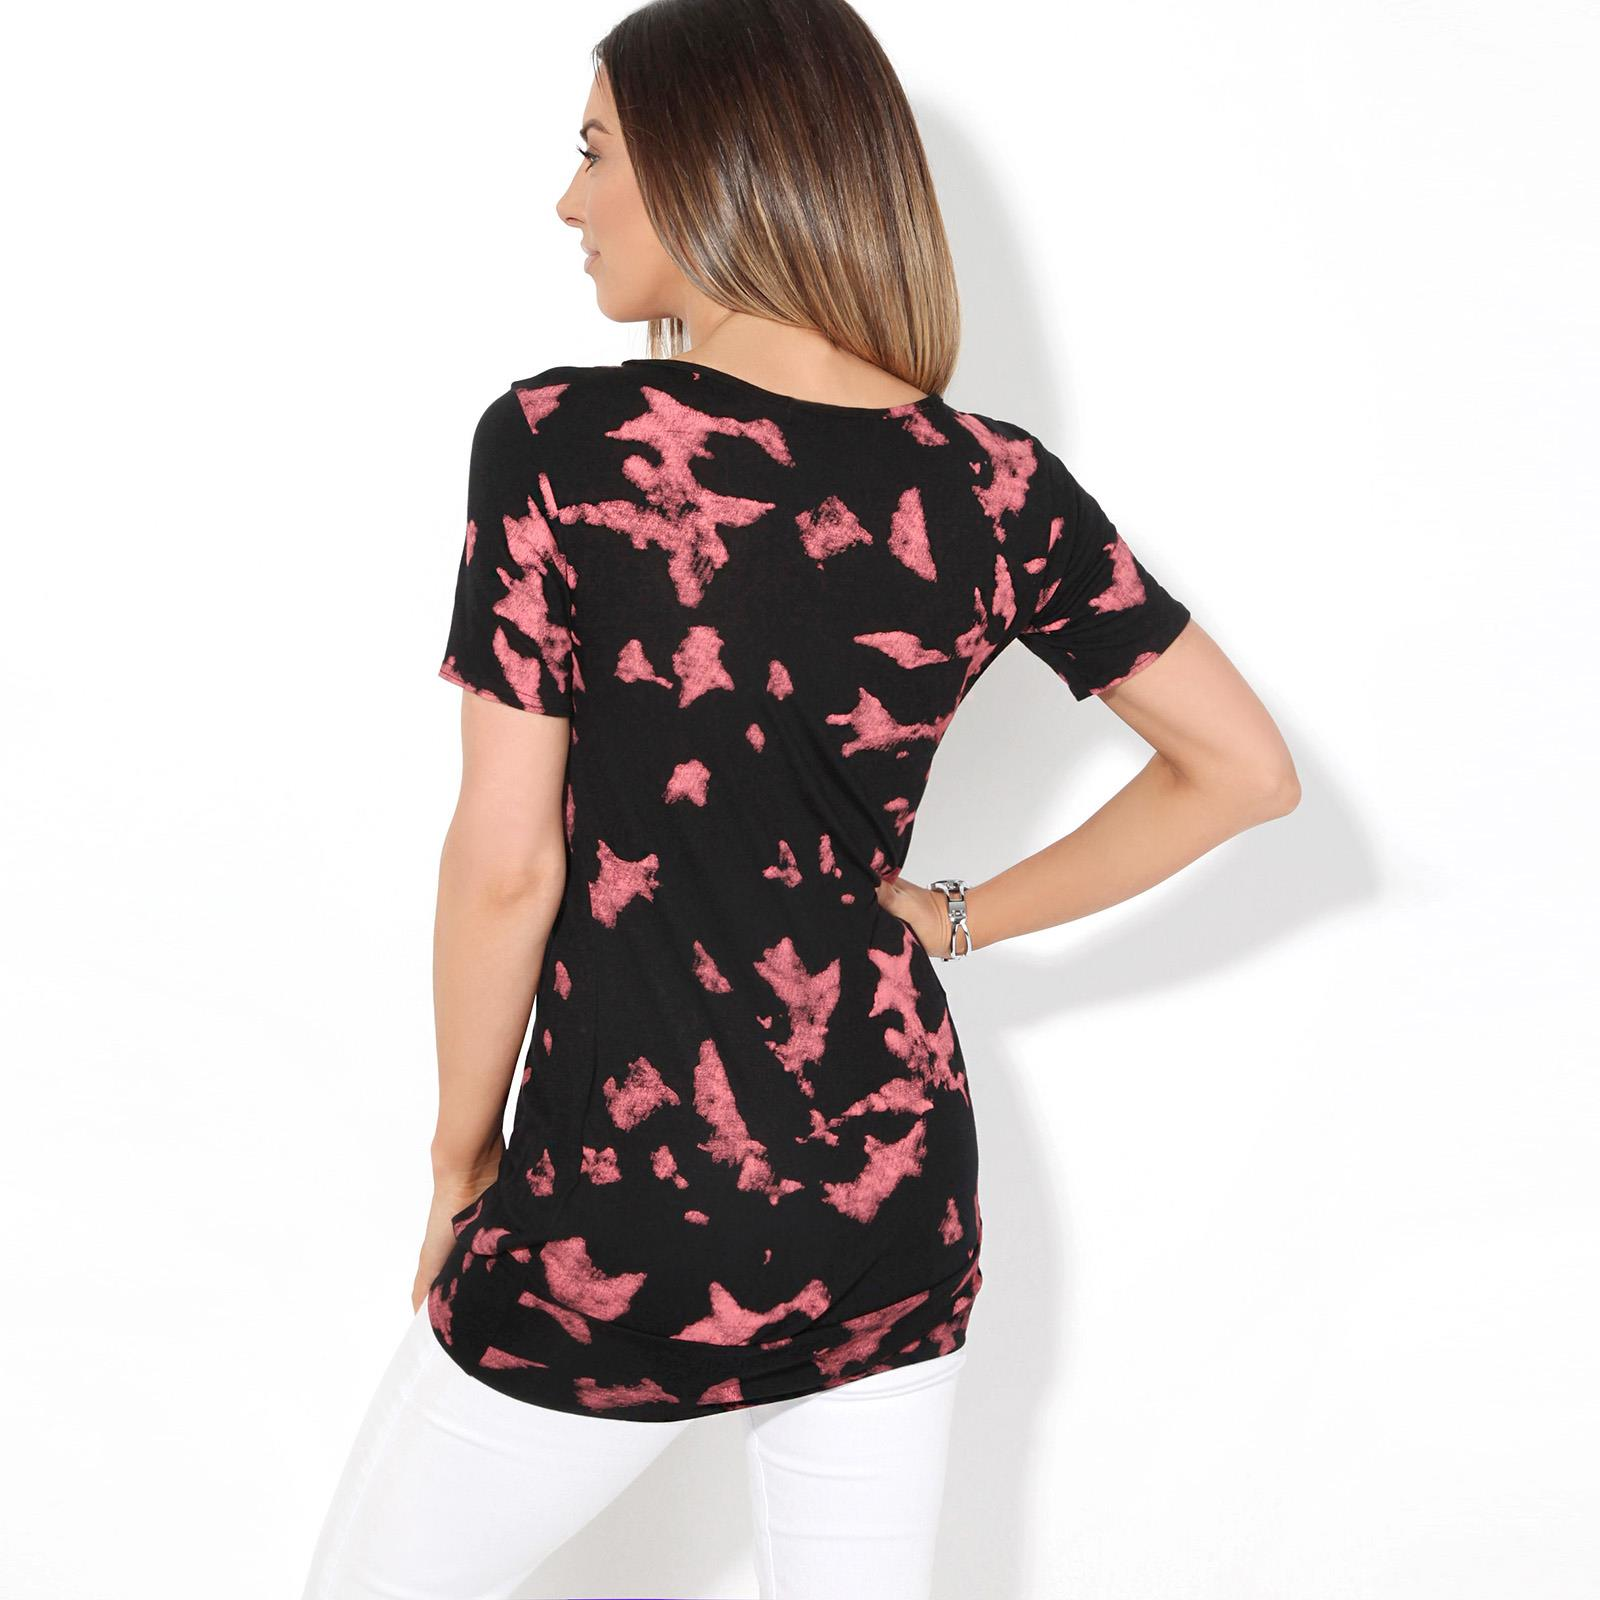 Womens-Ladies-Pattern-T-Shirt-Camo-Print-Blouse-Scoop-Neck-Baggy-Long-Top-Tunic thumbnail 3